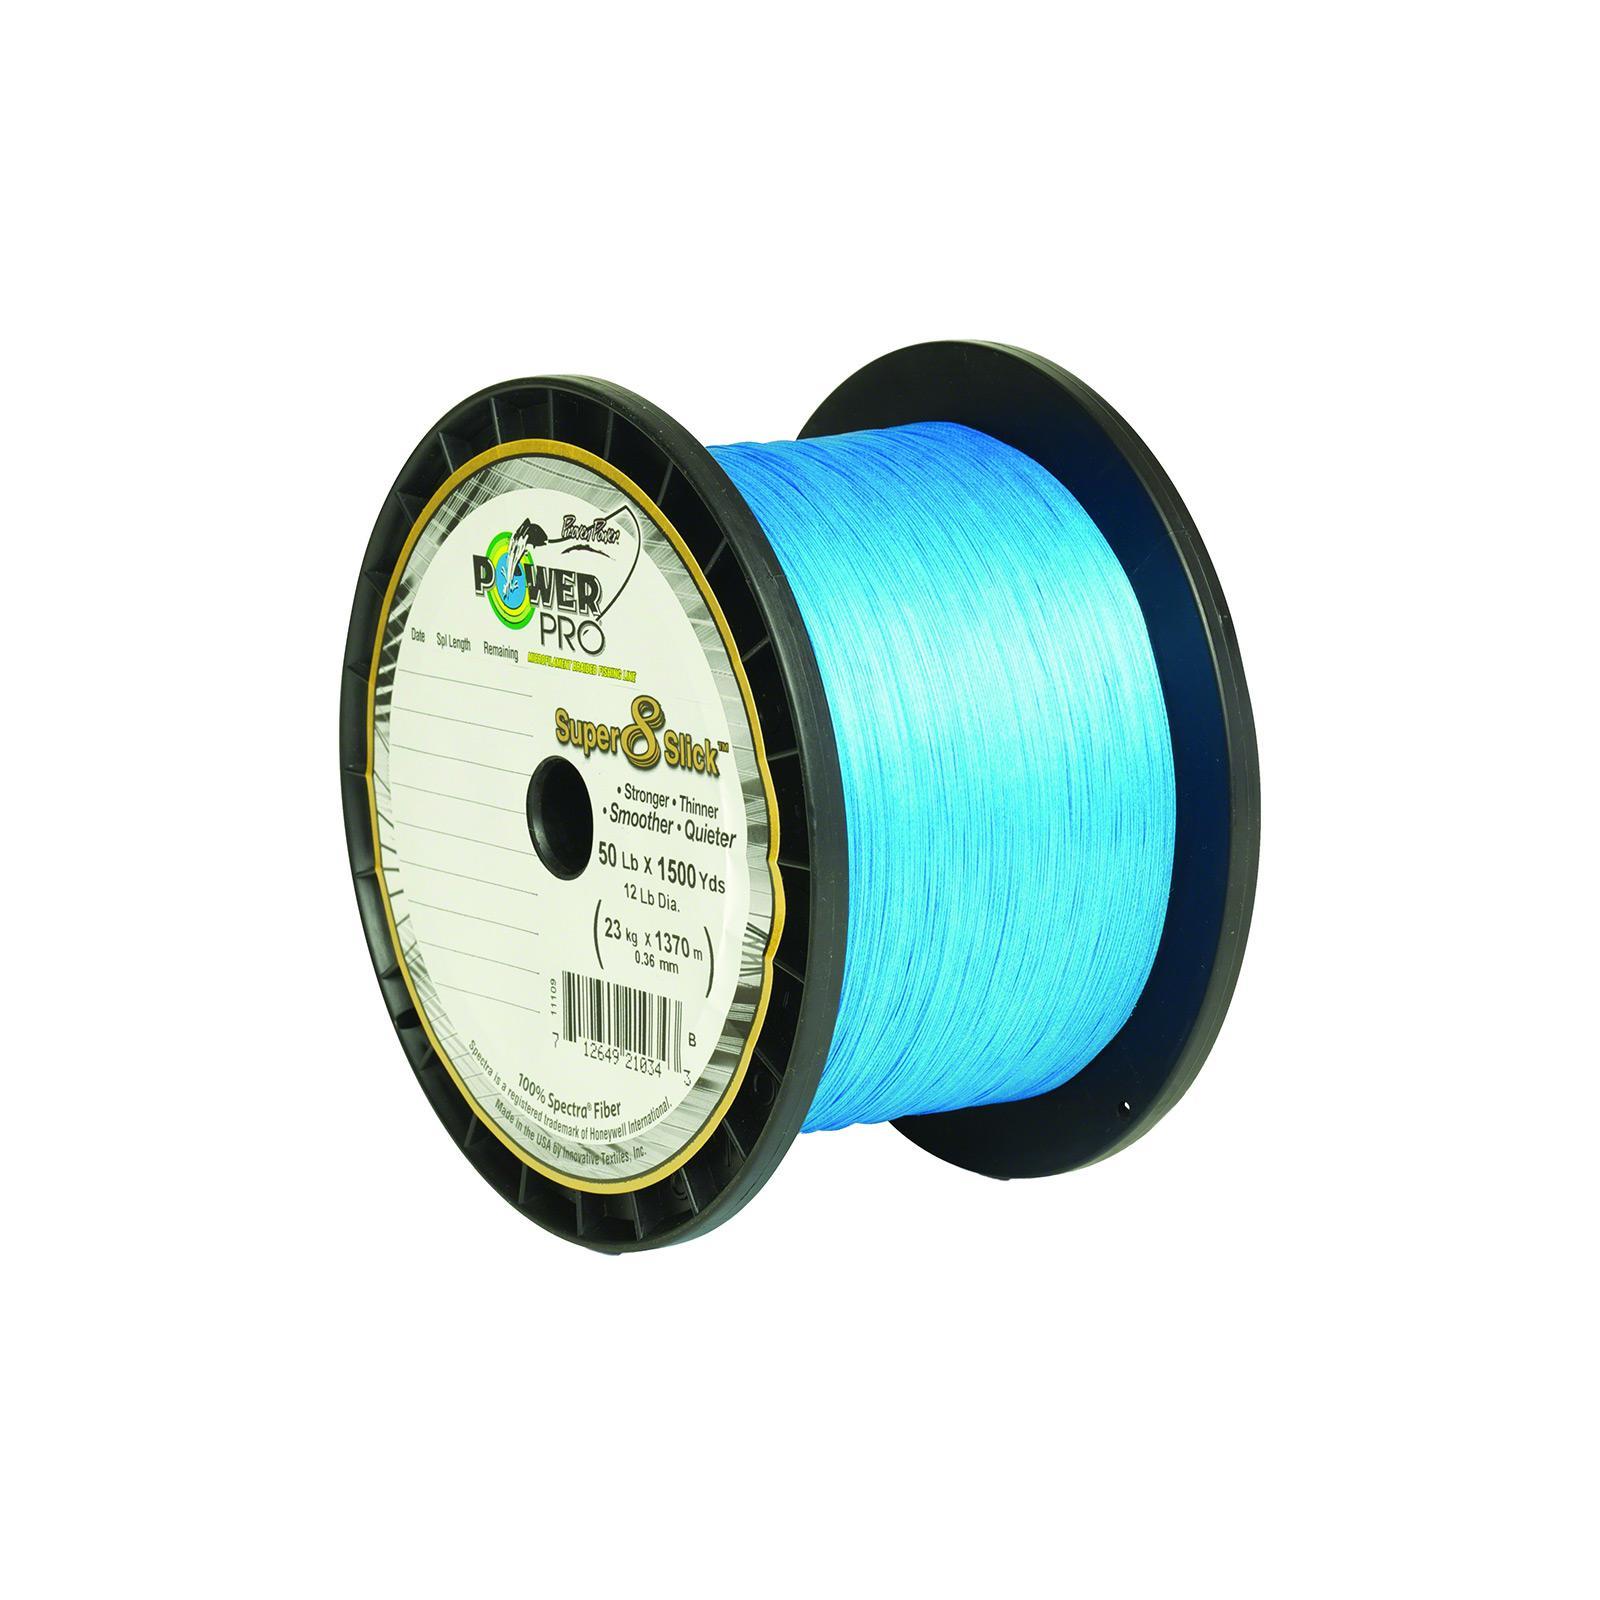 Power Pro Super Slick 30Lb 3000yd Marine Bluee, 31100303000A